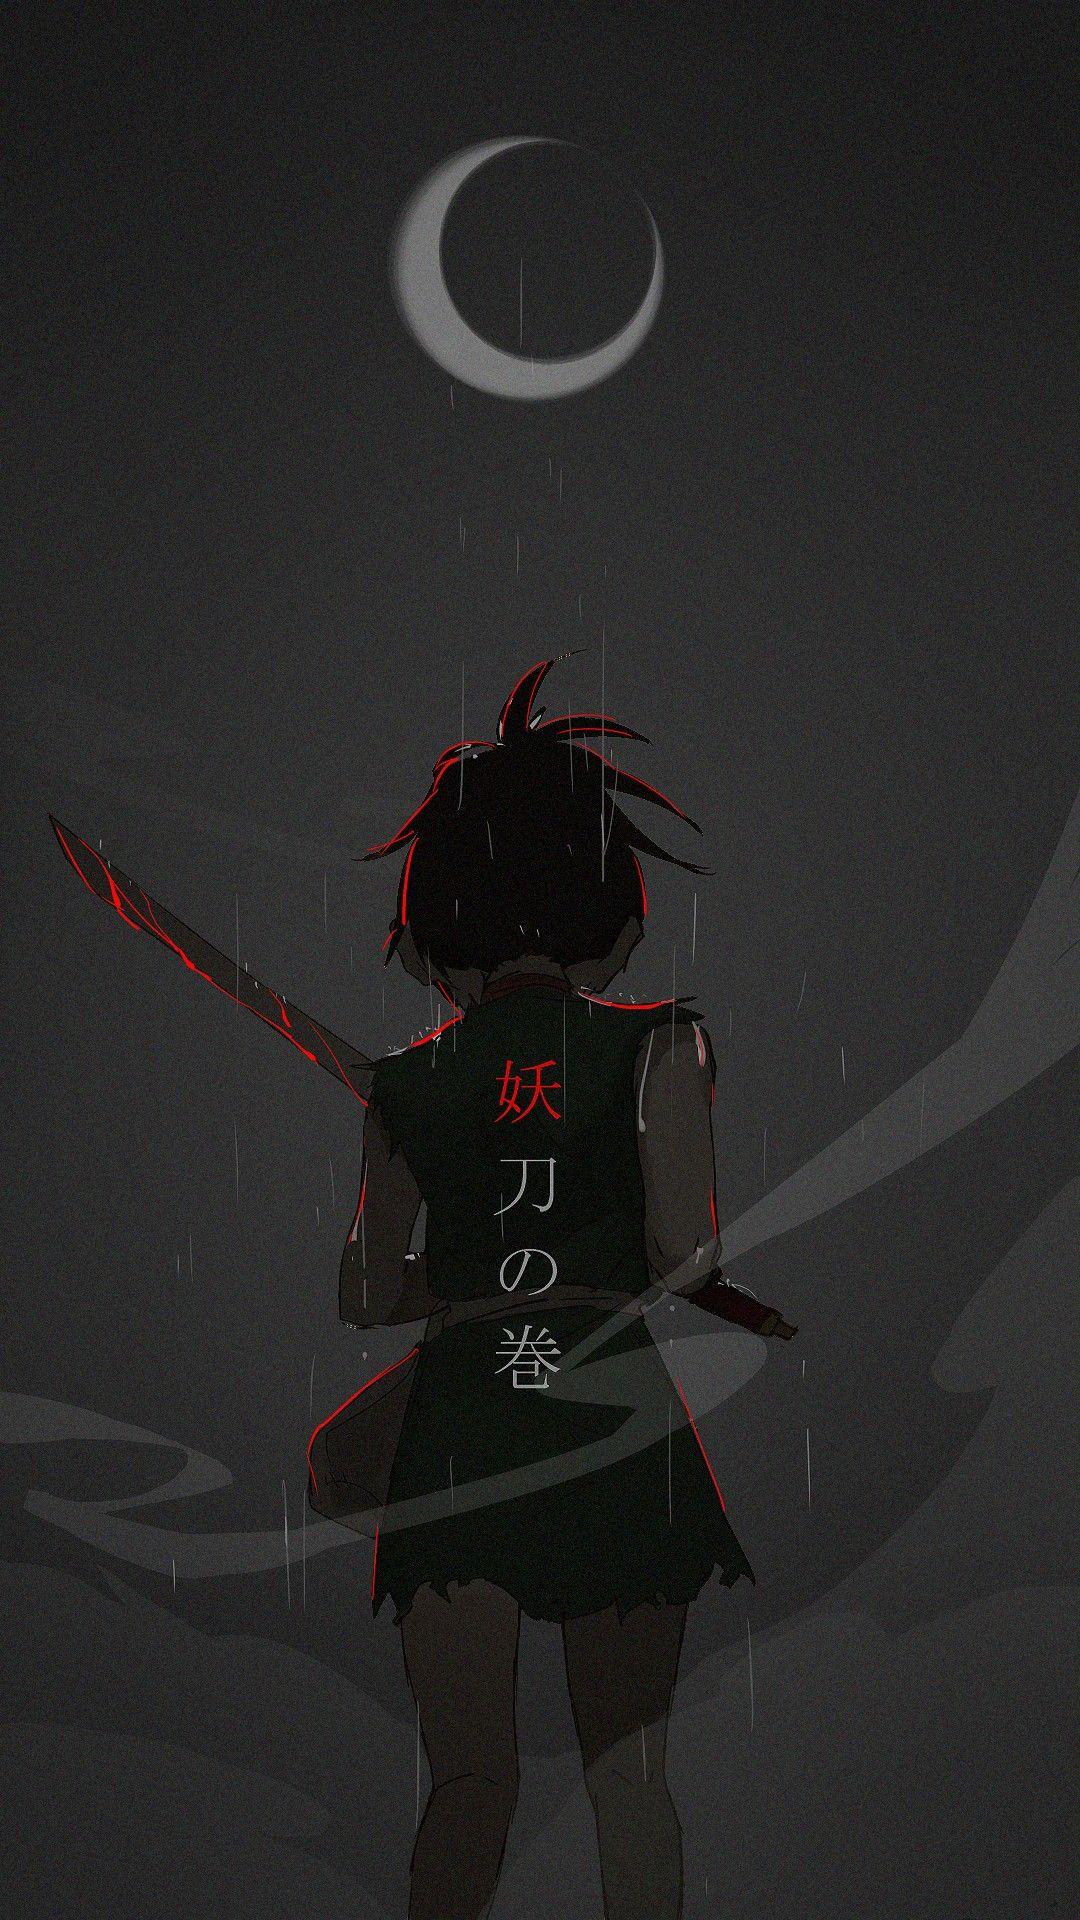 Dororo Anime Wallpaper Dark Anime Anime Scenery